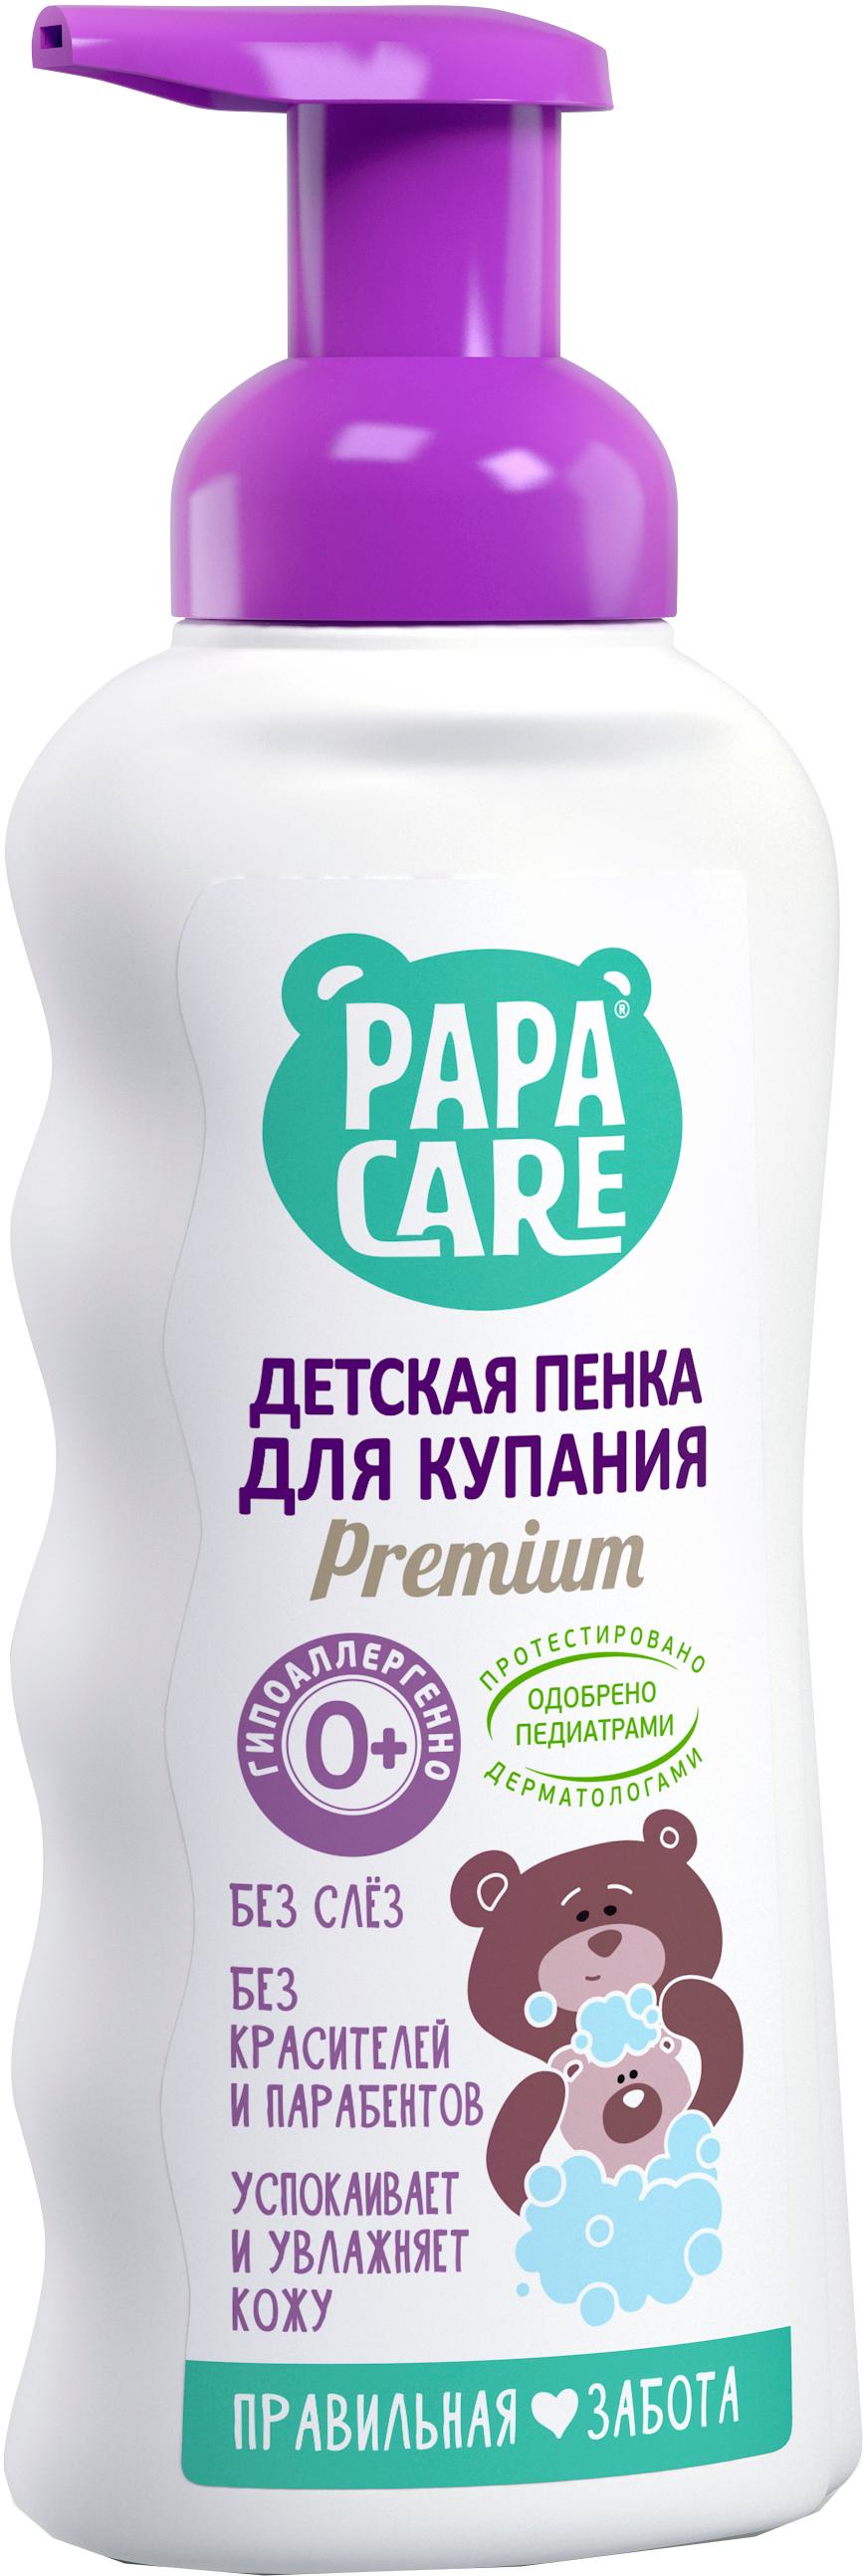 цены Пена Papa Care Papa Care 250 мл